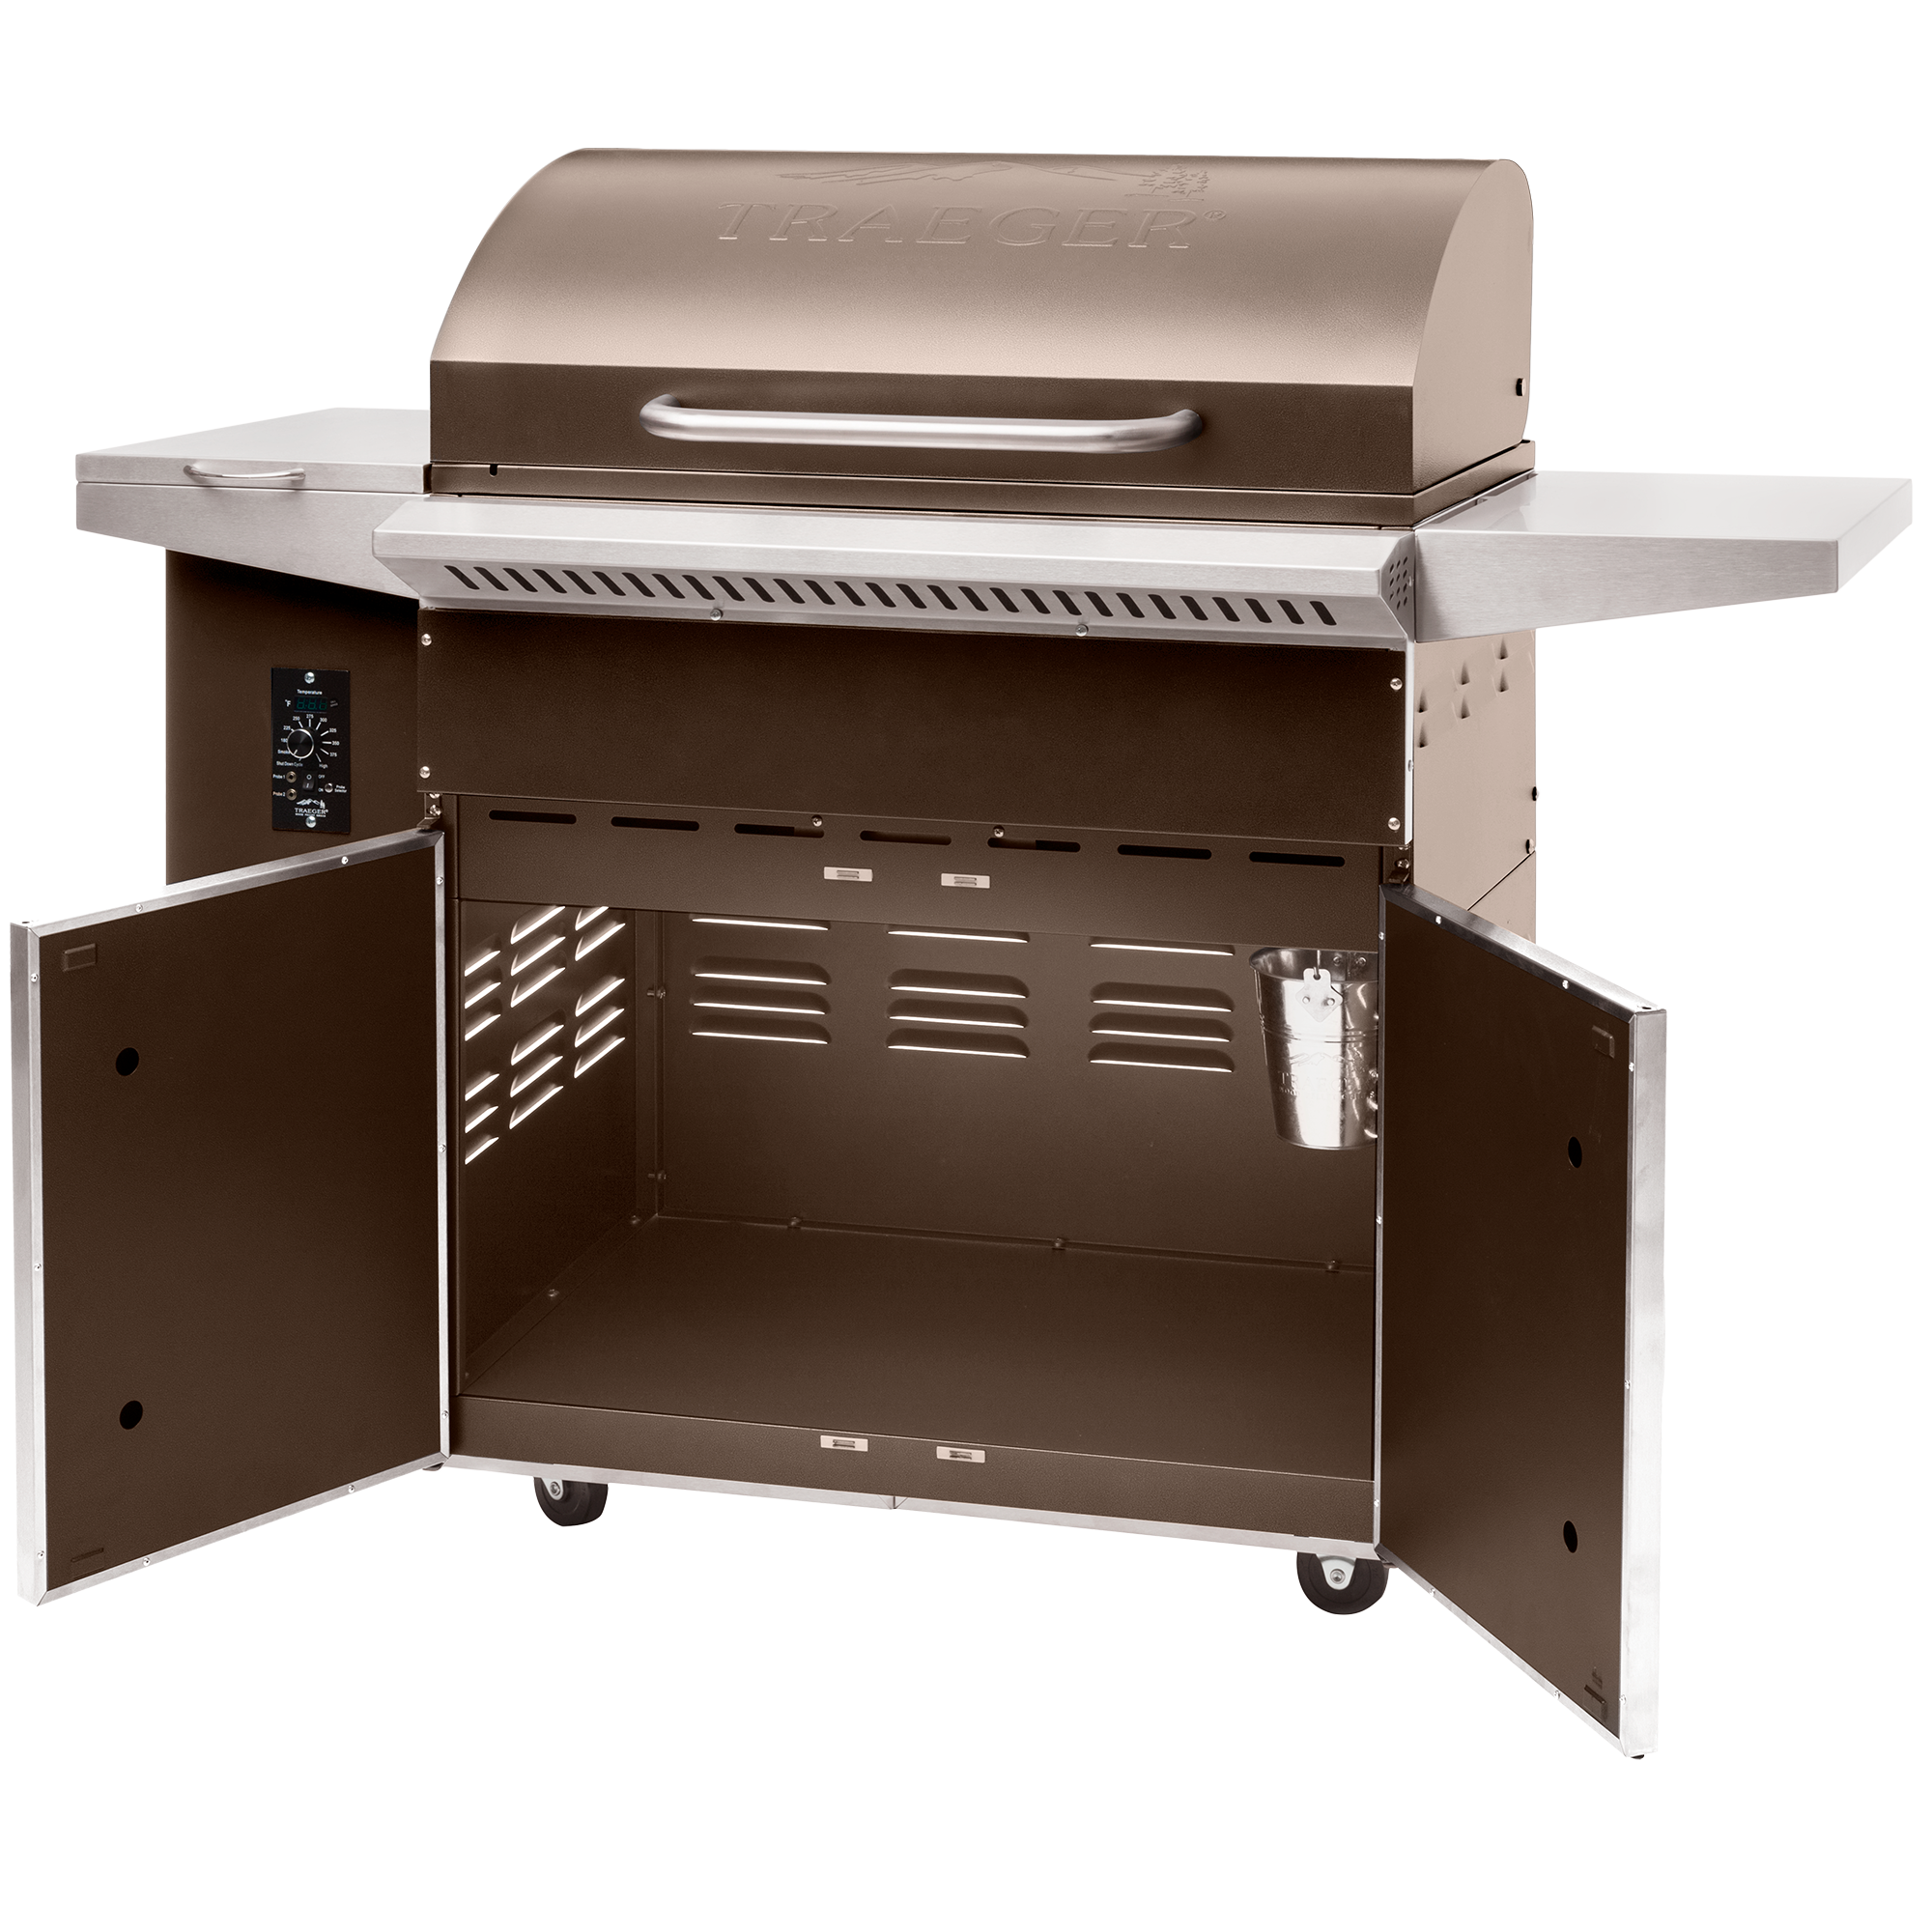 select pro pellet grill traeger wood fired grills rh traegergrills com Traeger Texas Wiring-Diagram Traeger BBQ070 Wiring-Diagram